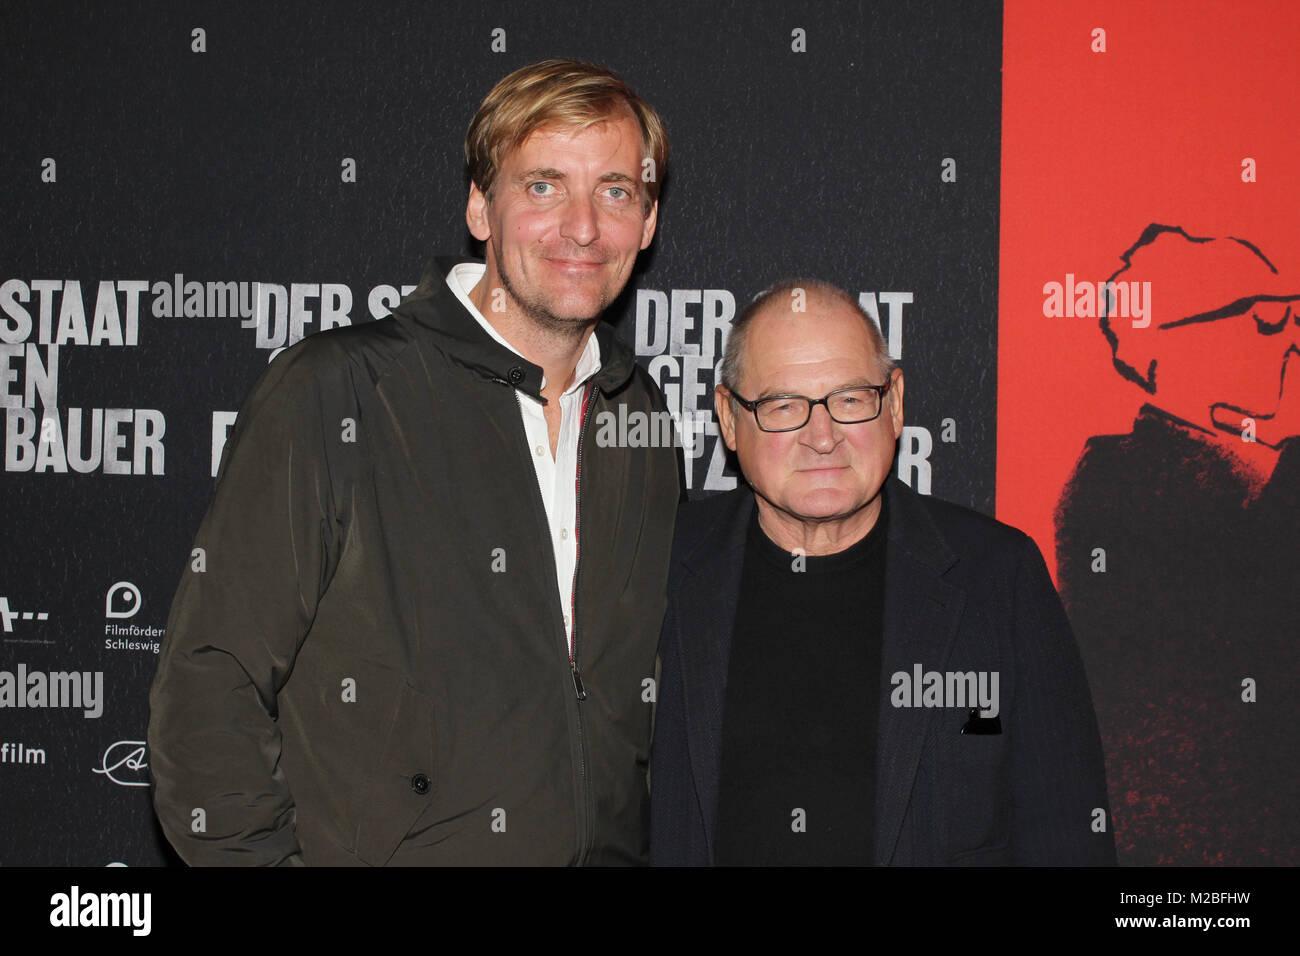 "Lars Kraume, Burghart Klaussner, Premiere ""der Staat gegen Frtiz Bauer, Abaton Hamburg, 28.09.2015 Stockbild"